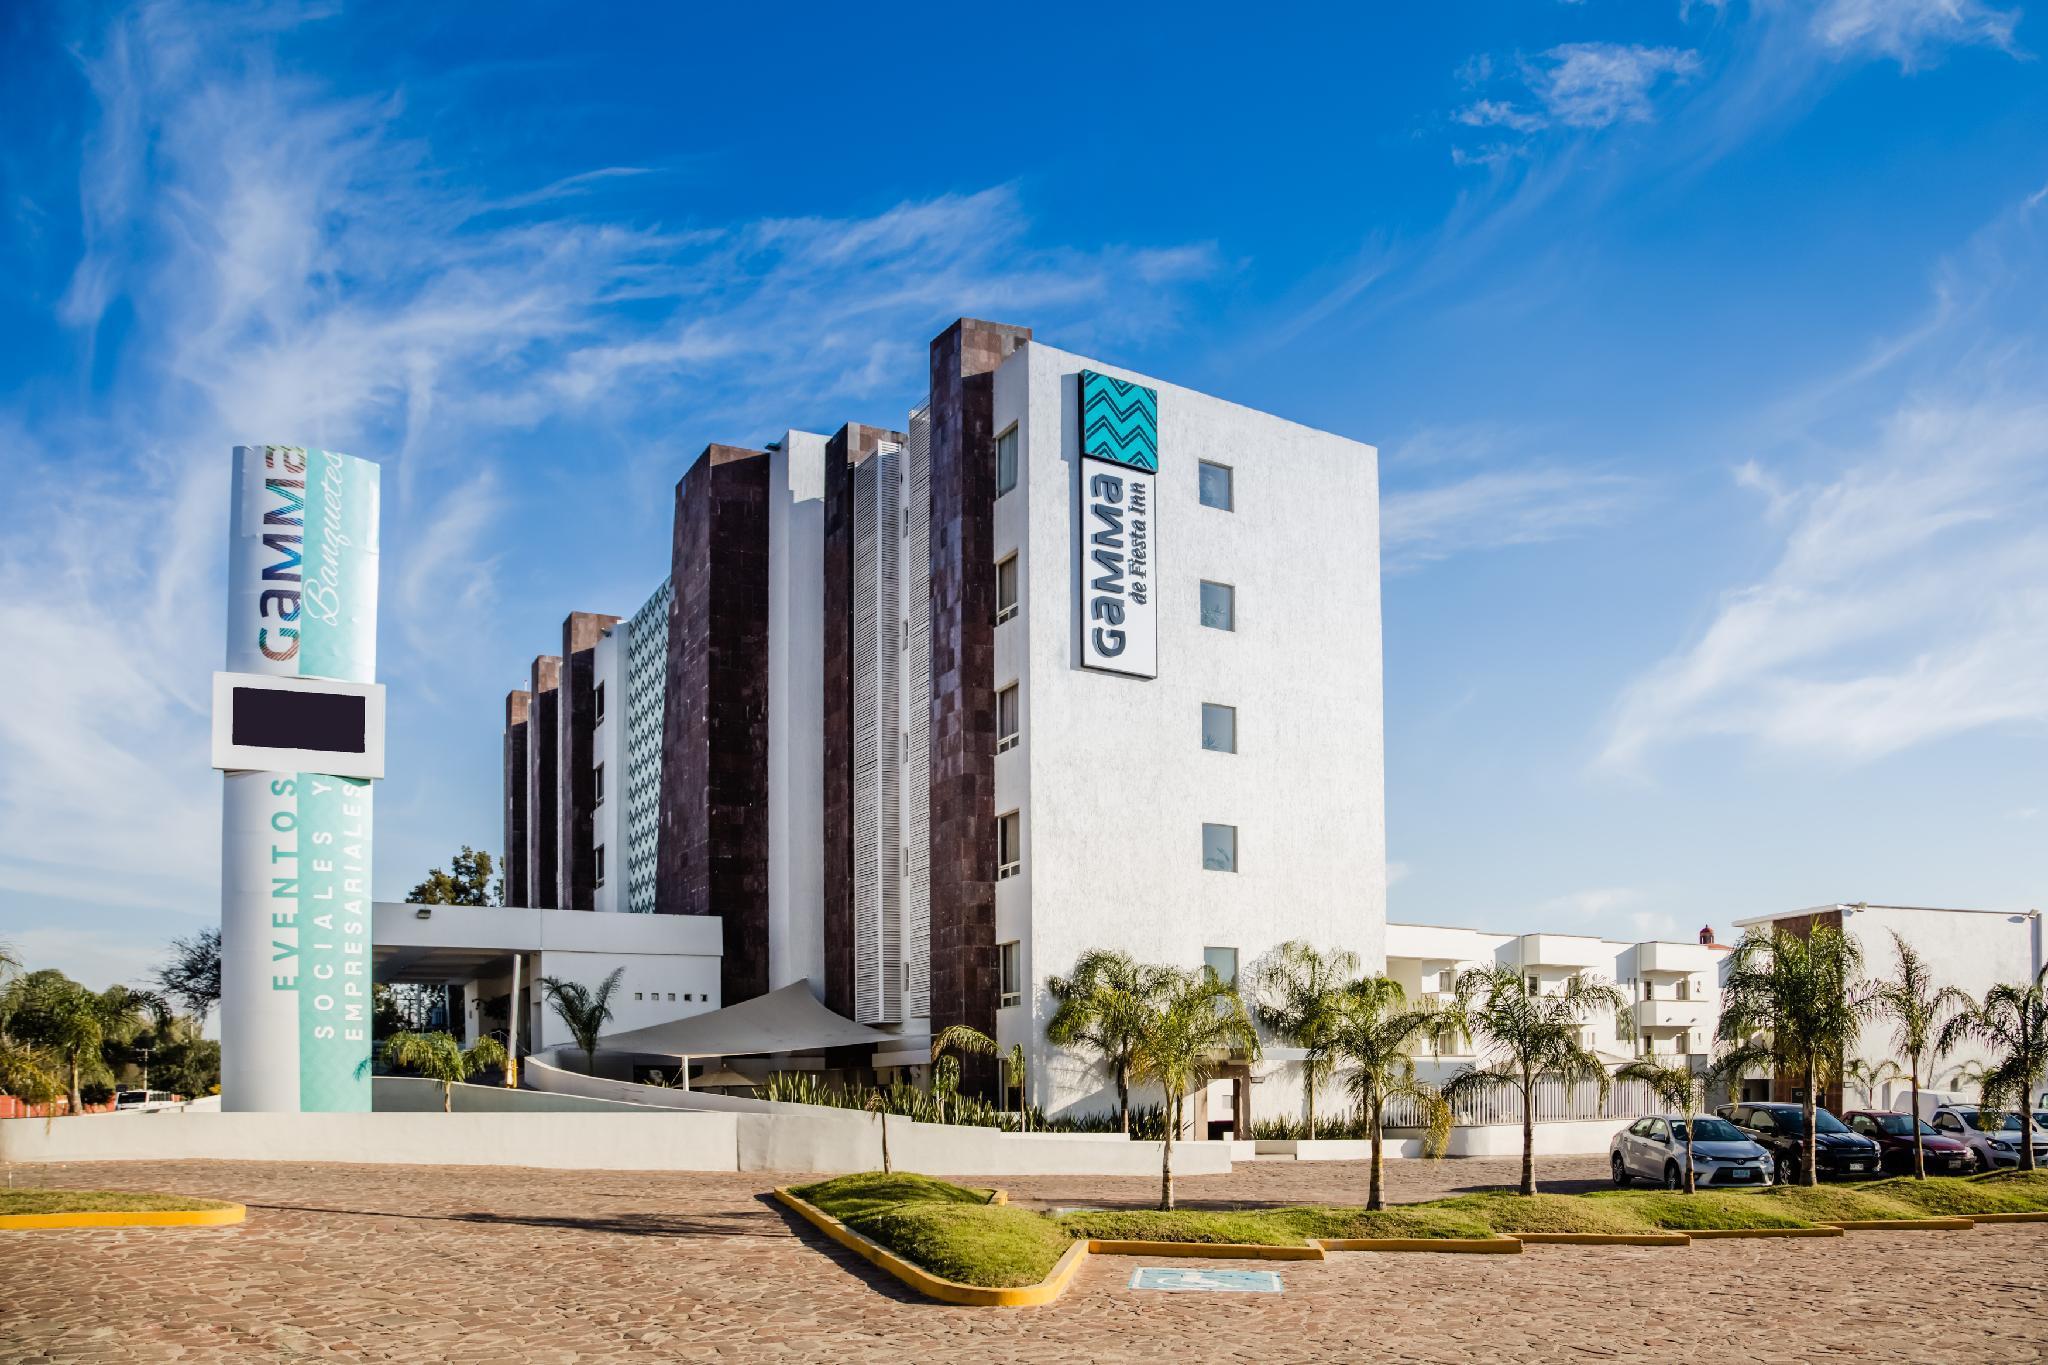 Gamma Leon Universidad De Fiesta Inn